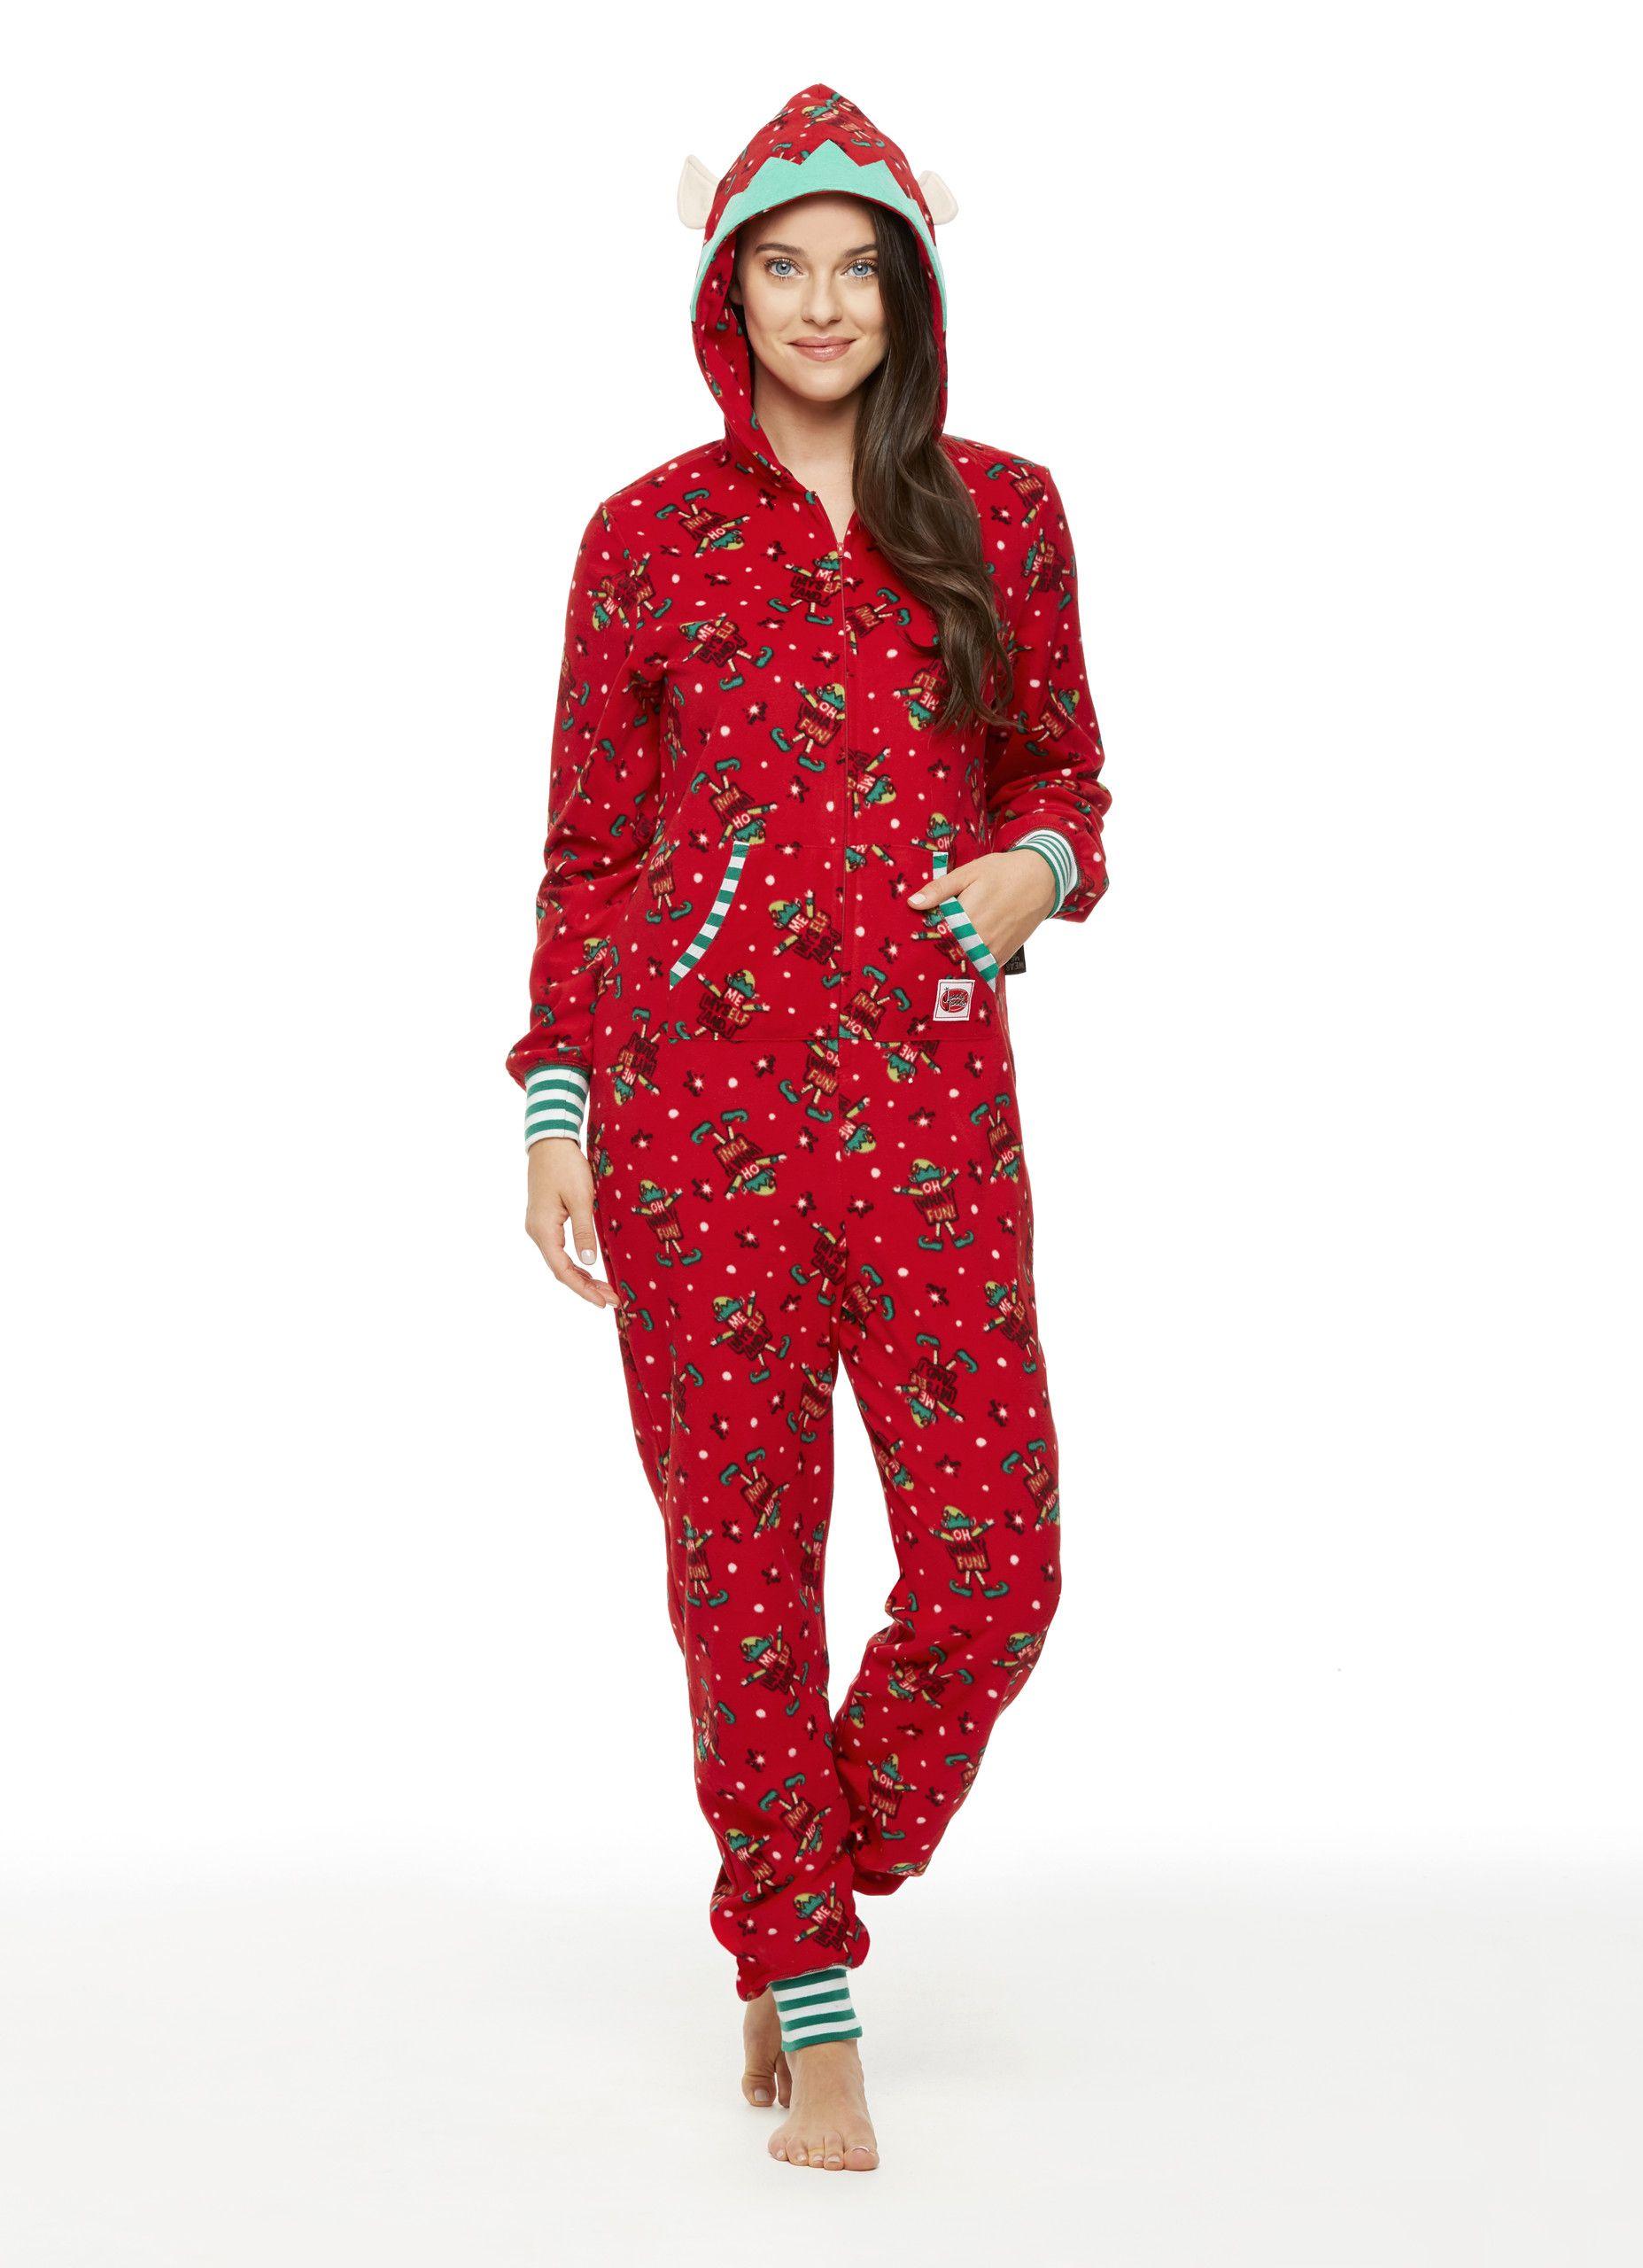 Elf ladies pajamas Matching family outfits, Matching